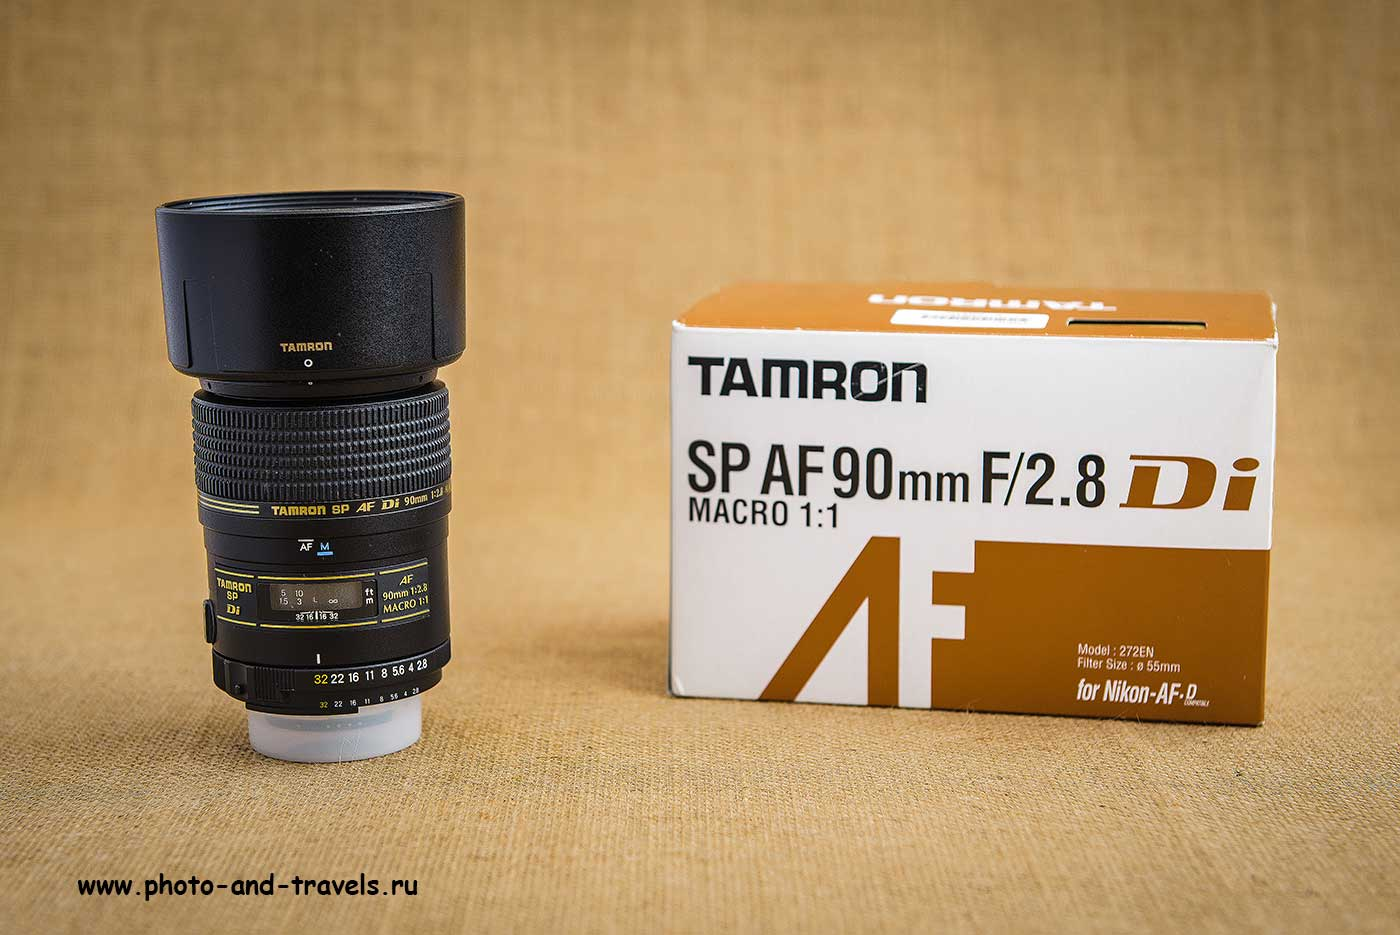 Фото 2. Макрообъектив Tamron SP AF 90mm f/2.8 Di MACRO 1:1 и оригинальная упаковка (24-70, 0.8сек, M, f11, 70mm, ISO 100)